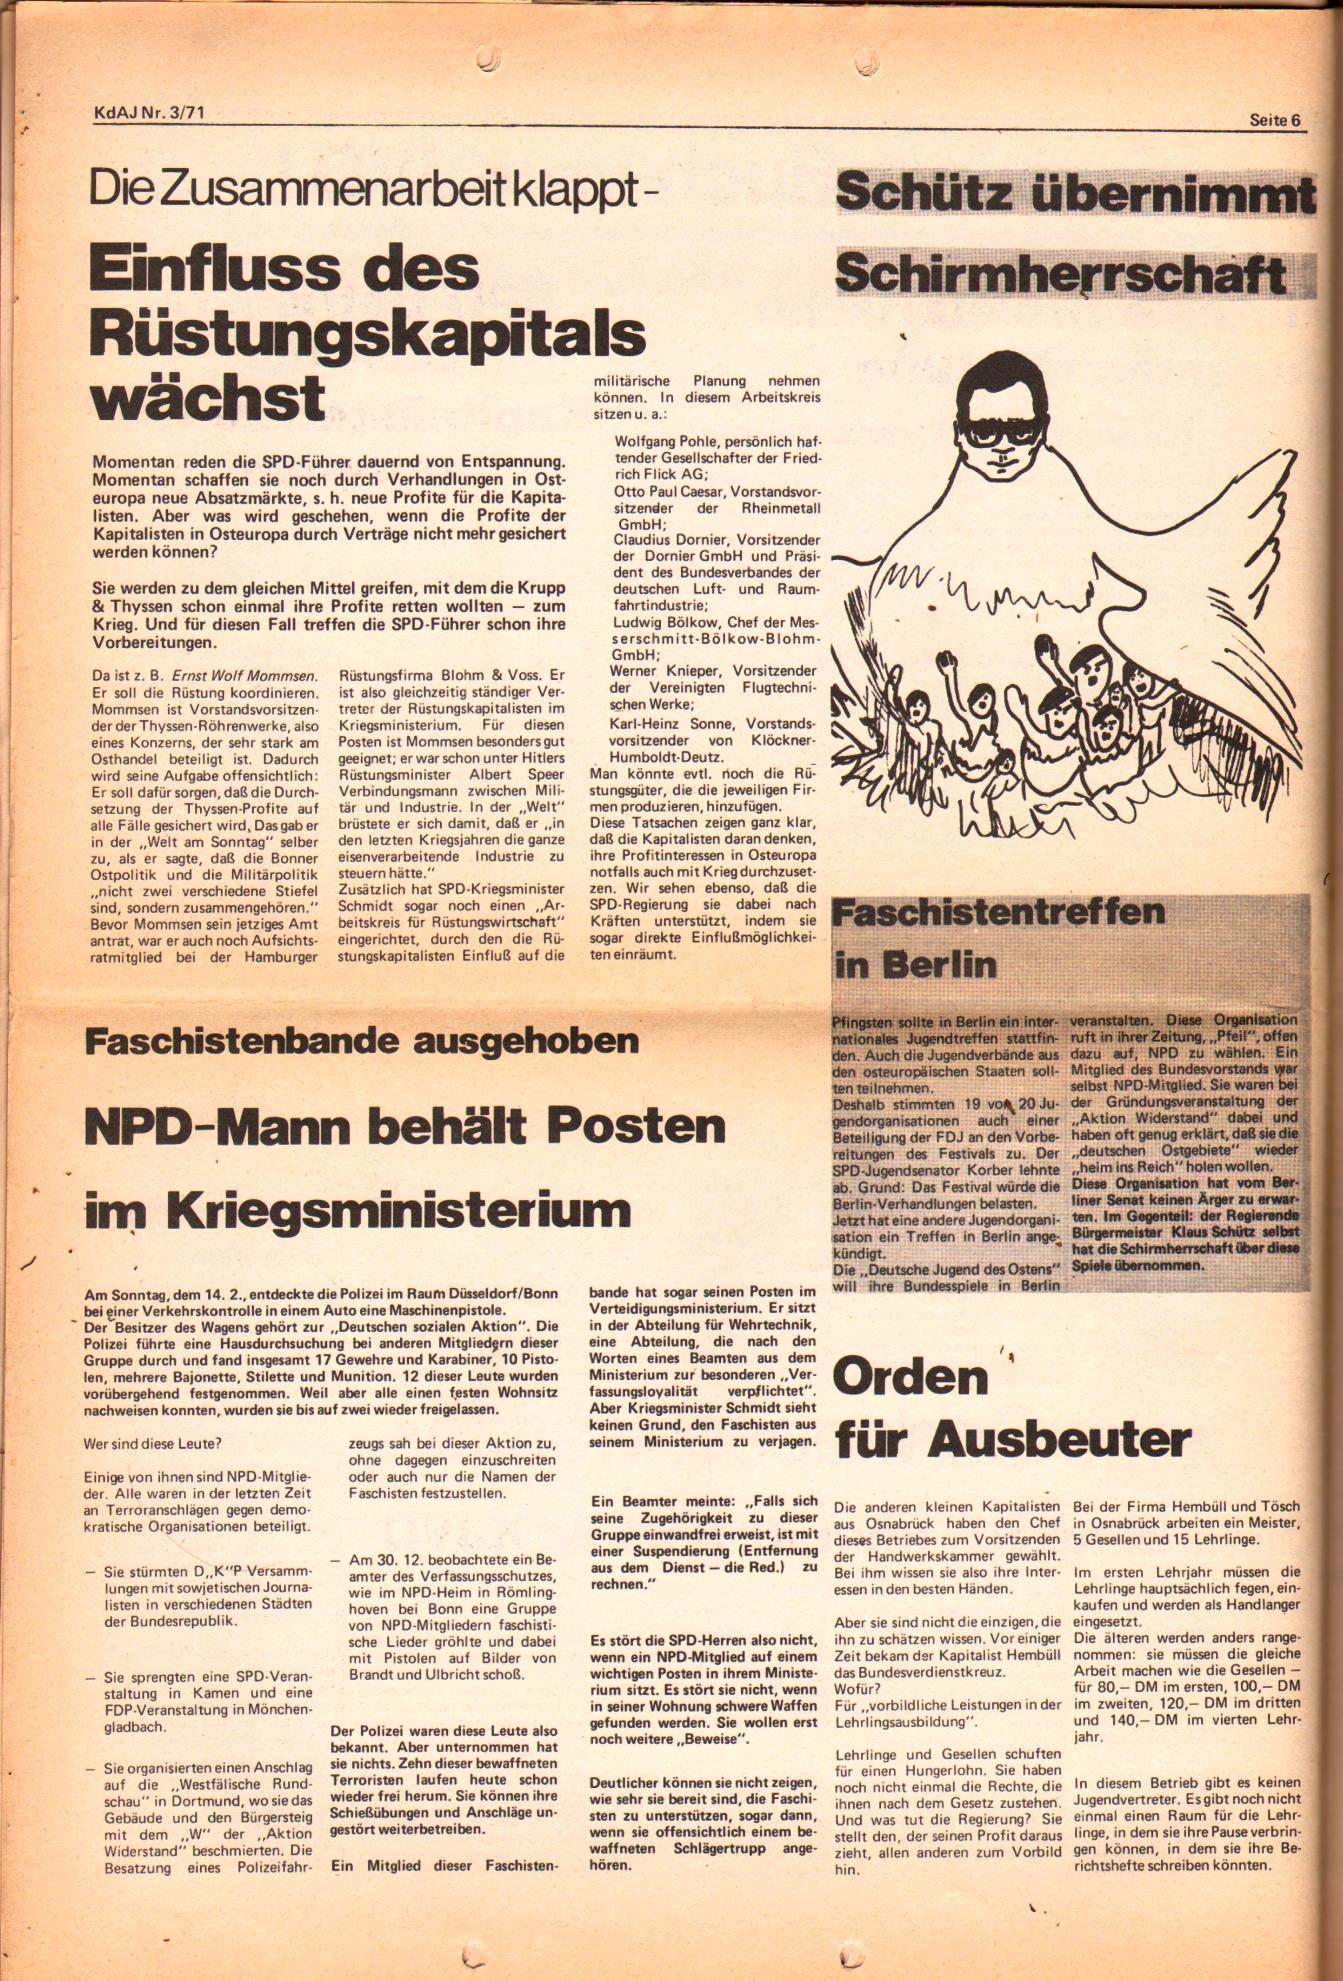 KDAJ, 2. Jg., März 1971, Nr. 3, Seite 6